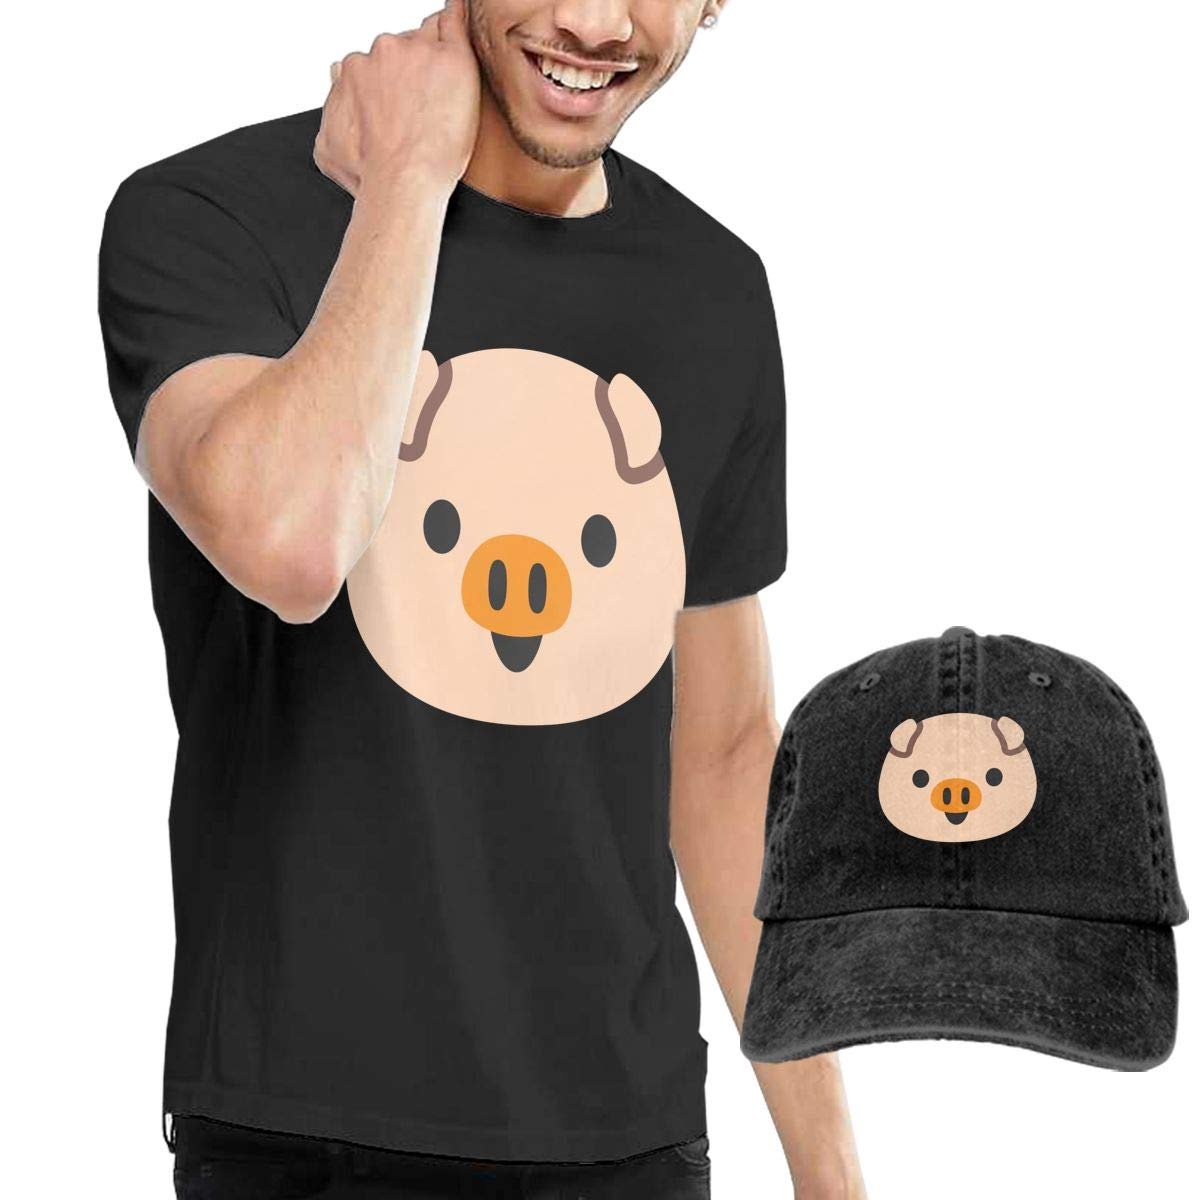 Pig Fashion Mens T-Shirt and Hats Youth /& Adult T-Shirts